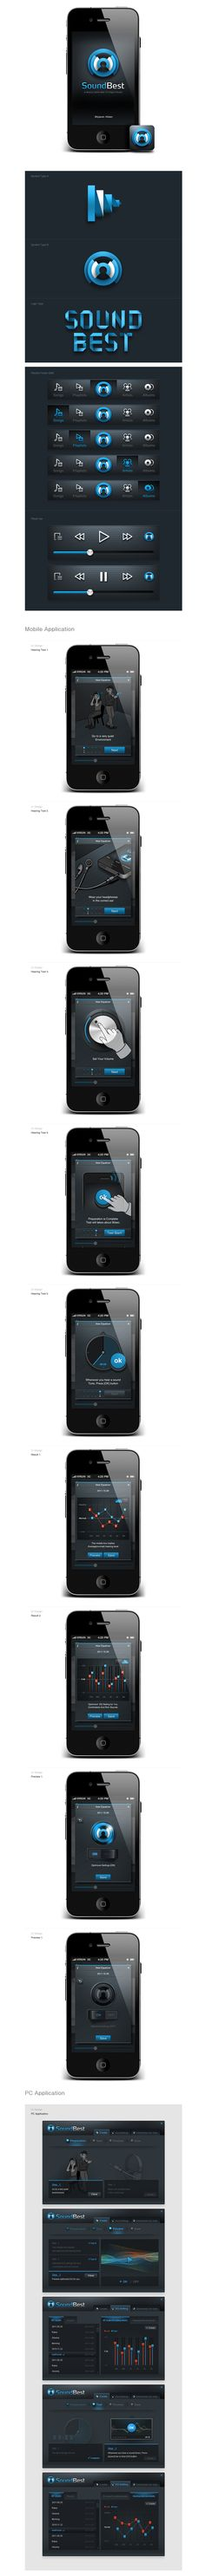 Soundbest player /   Mobile+PC Application